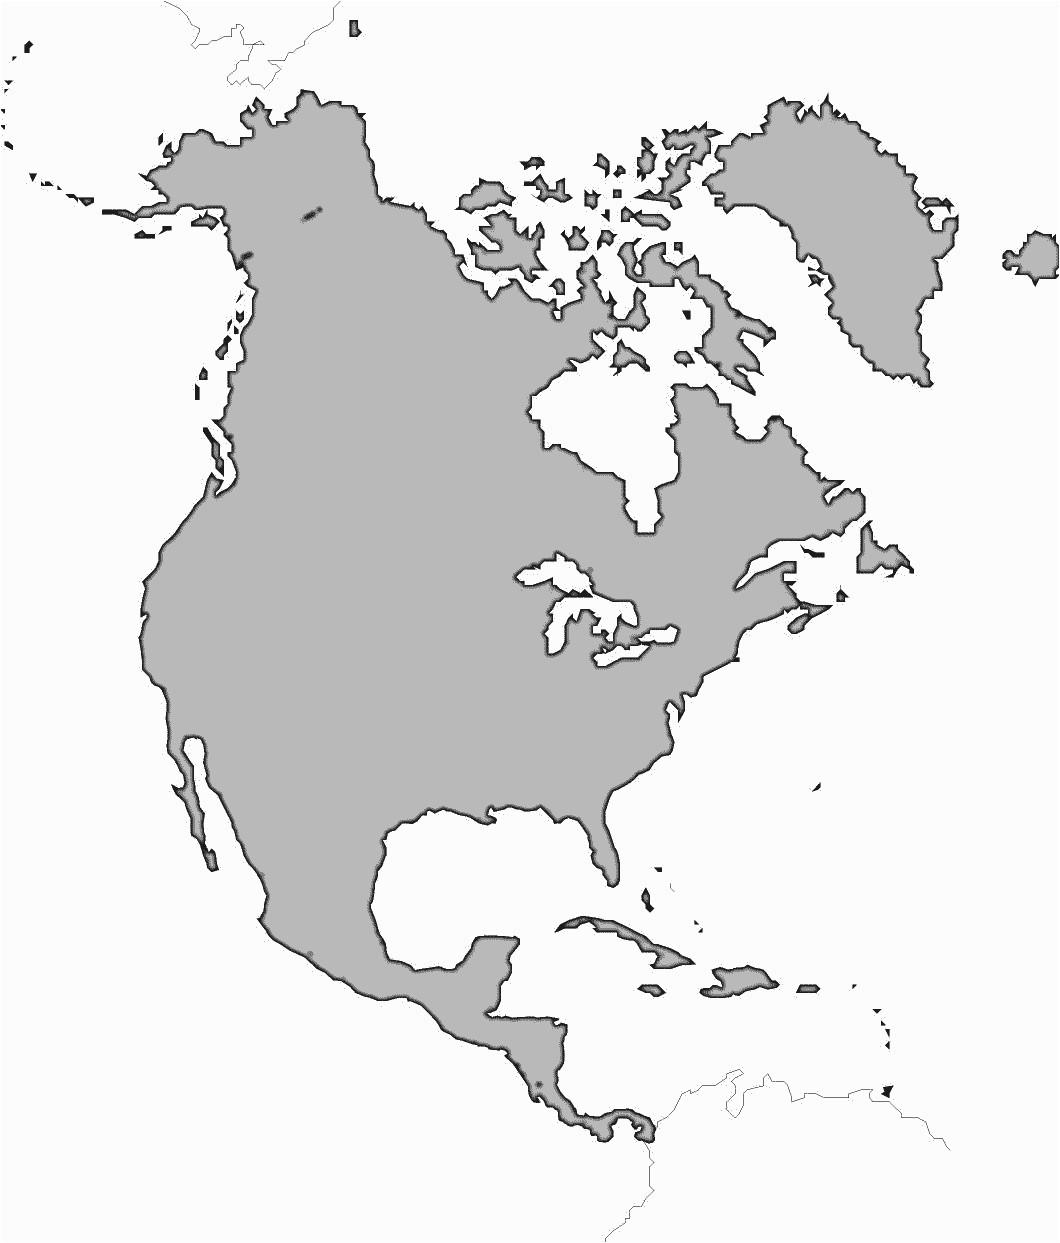 Western Hemisphere Maps Printable Guvecurid Outline Map Of North - Free Printable Outline Map Of North America